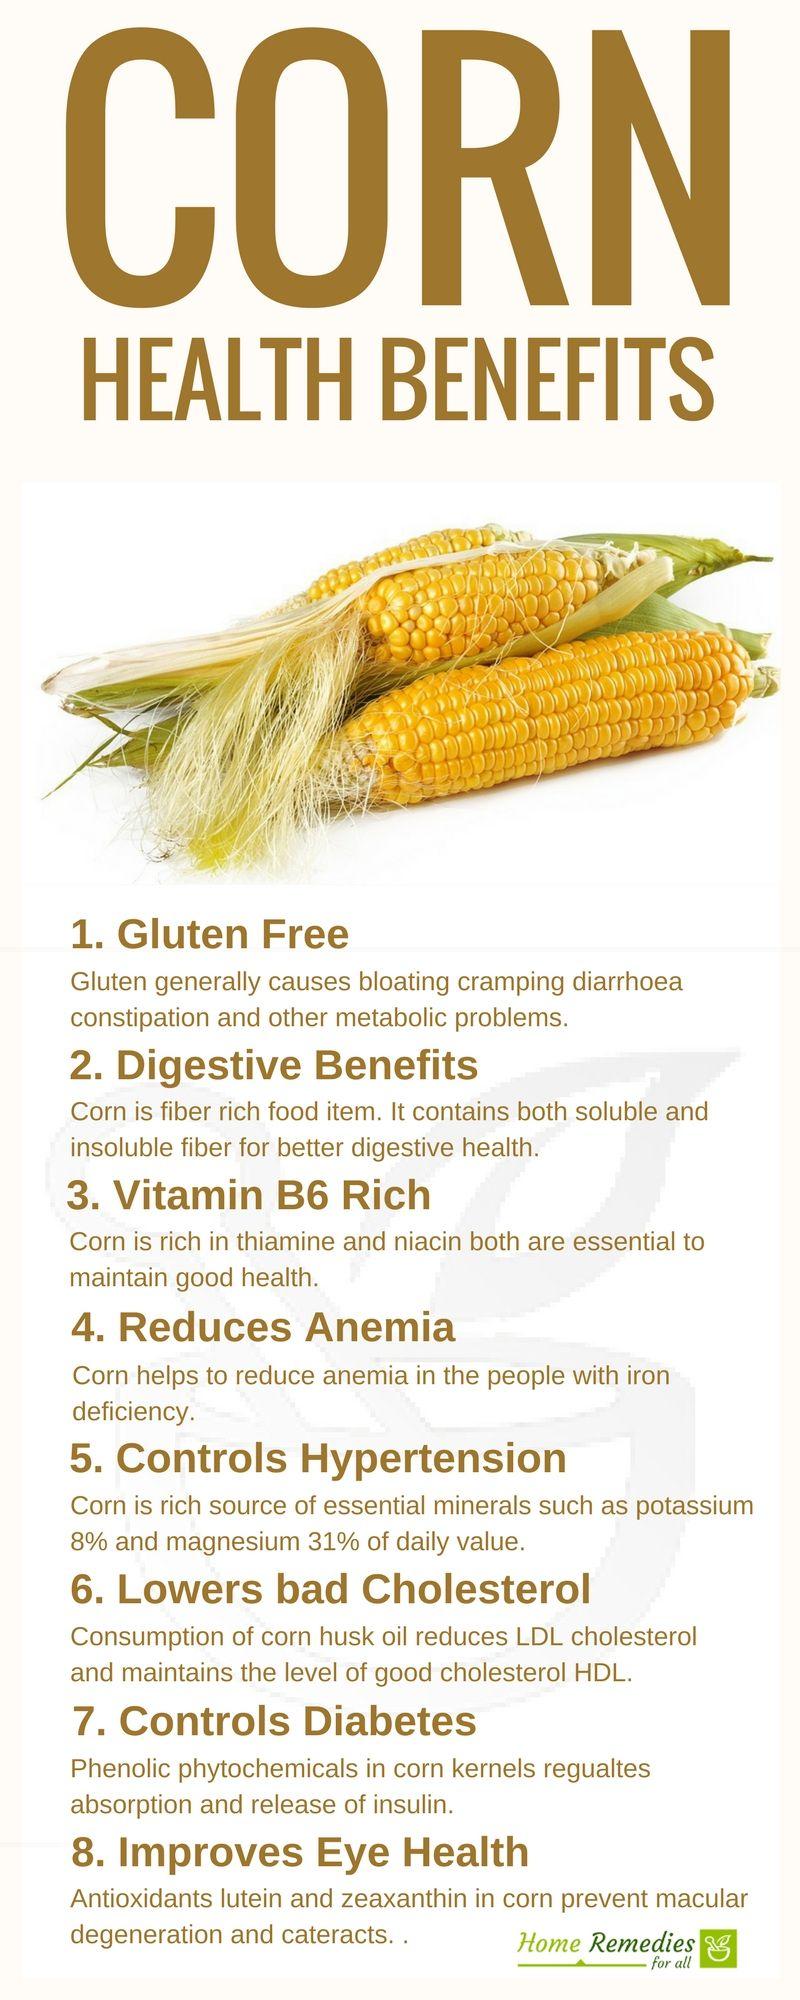 10 Makanan Pengganti Nasi Yang Baik Ketika Diet